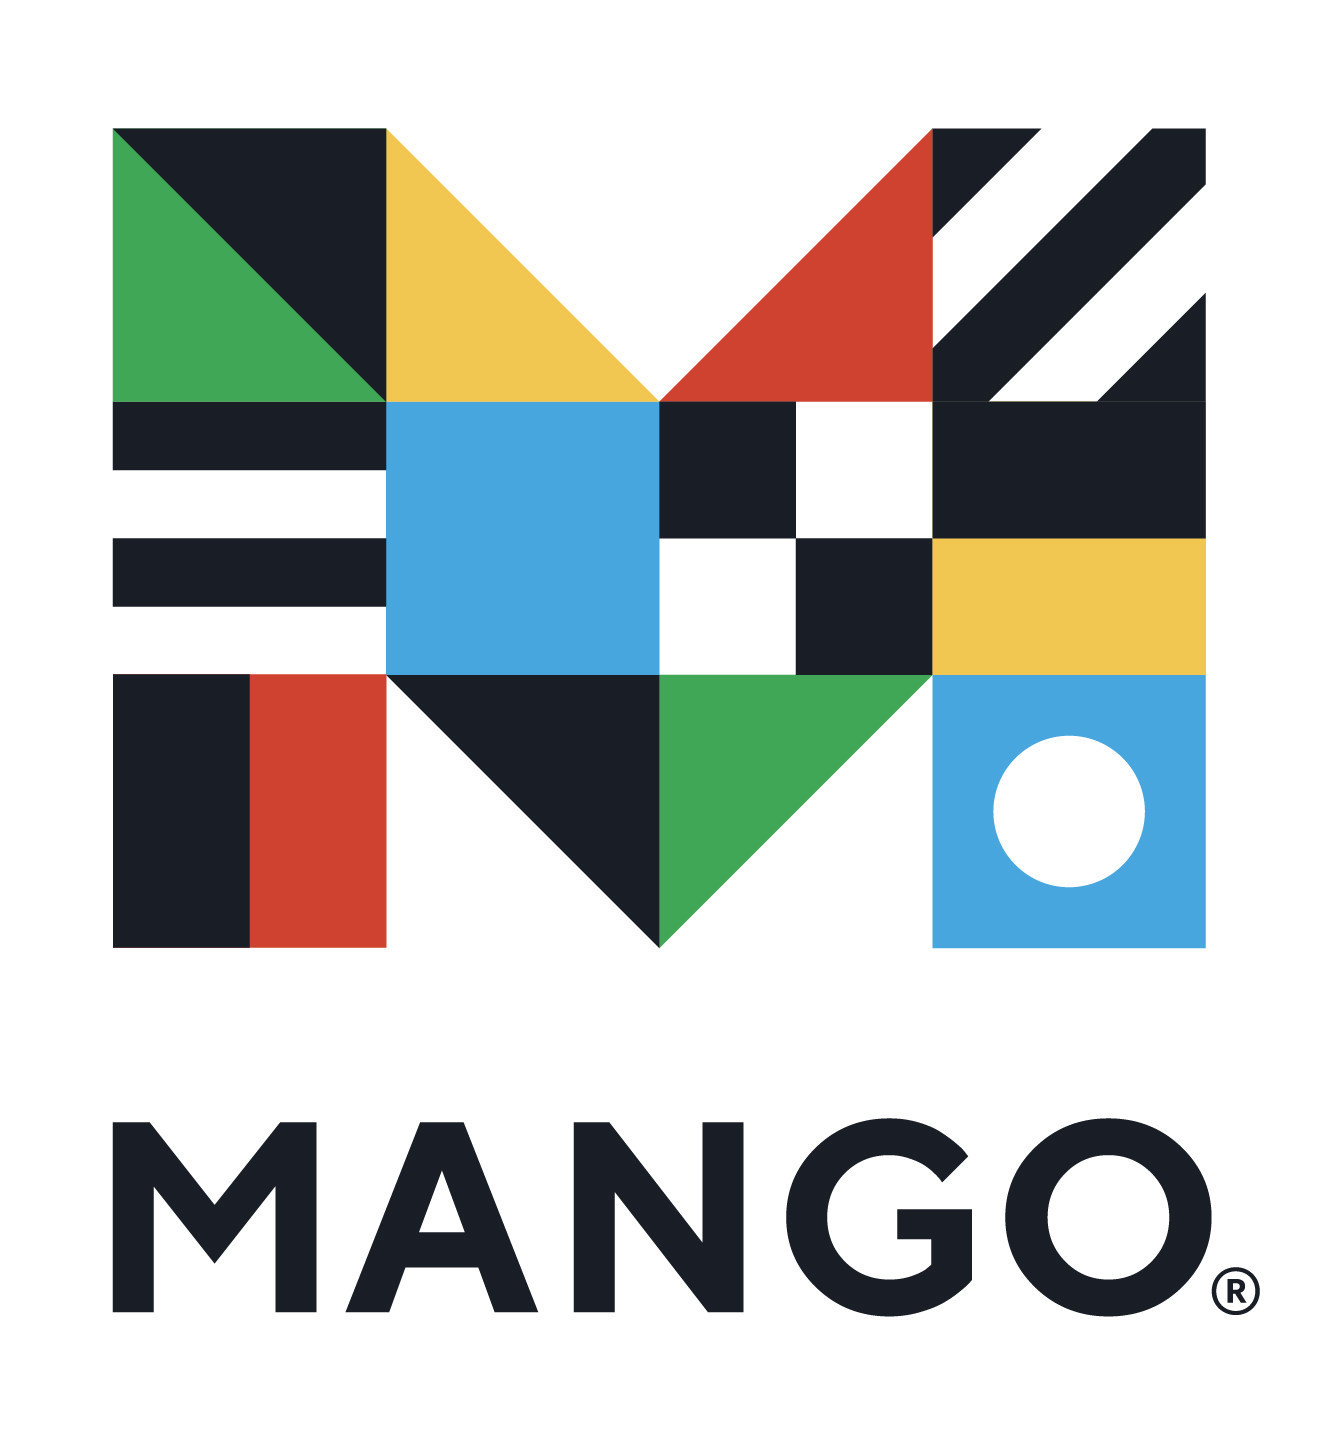 MANGO LANGUAGES OFFERS FREE LESSON PLANS TO WORLD LANGUAGE TEACHERS